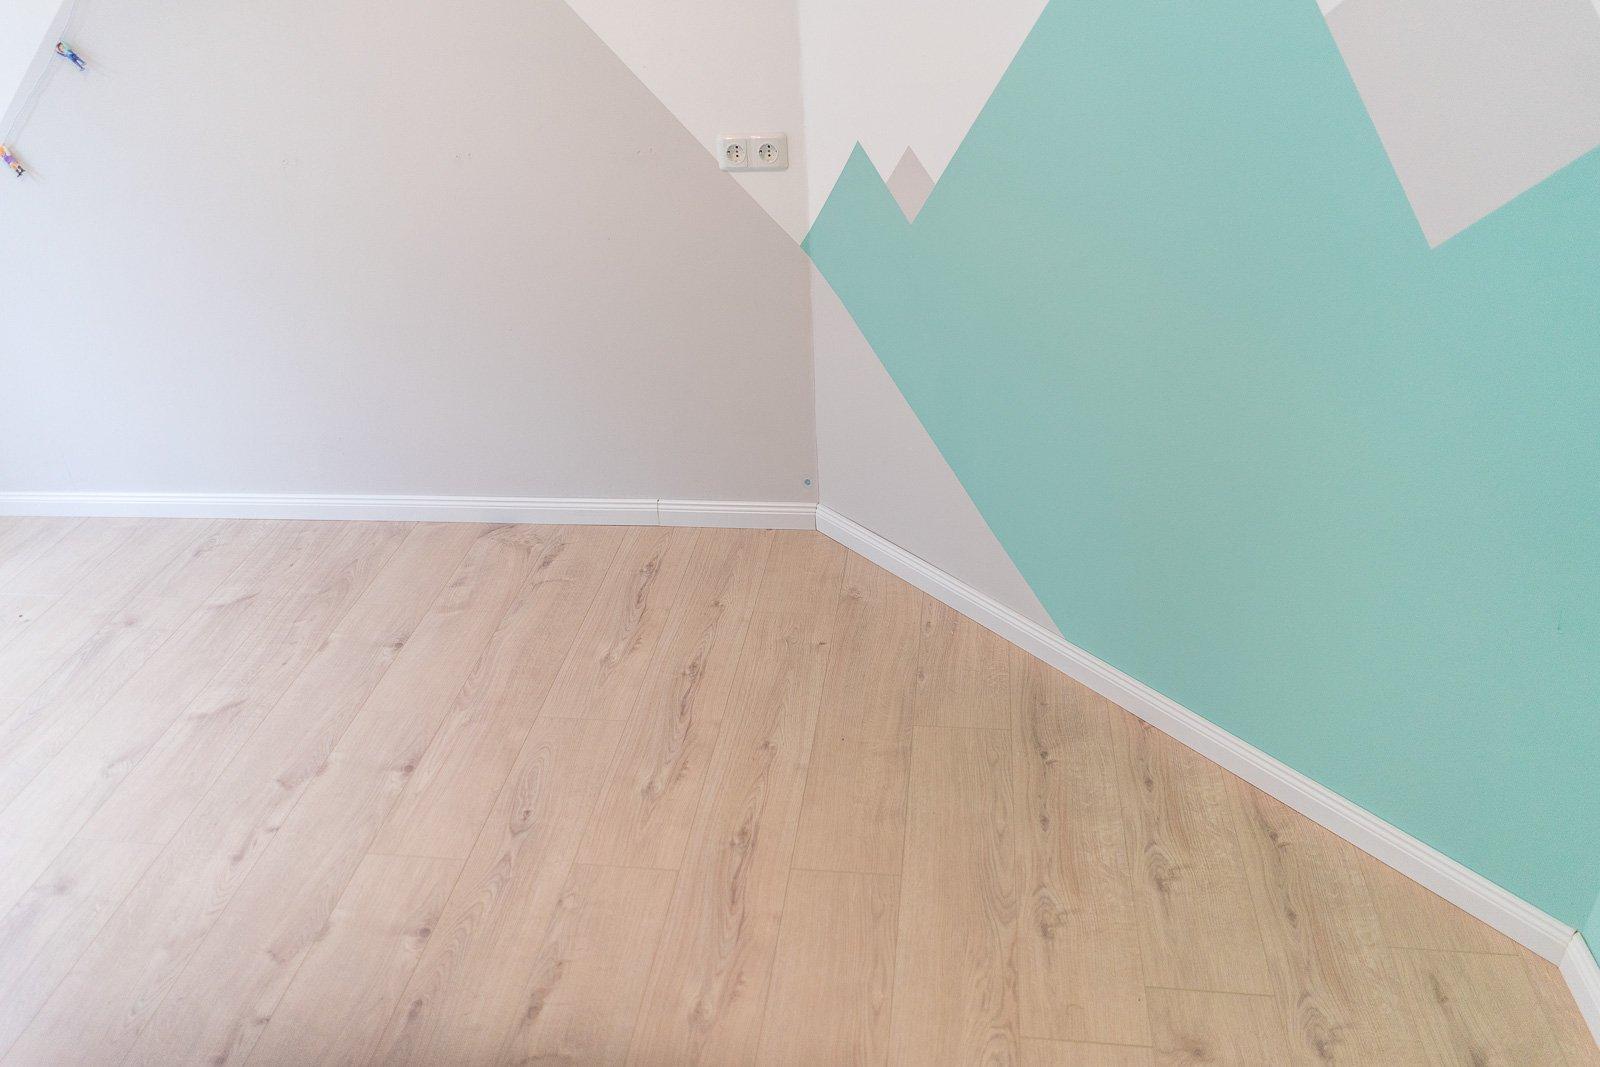 kinderzimmer renovieren teil 3 laminat verlegen. Black Bedroom Furniture Sets. Home Design Ideas